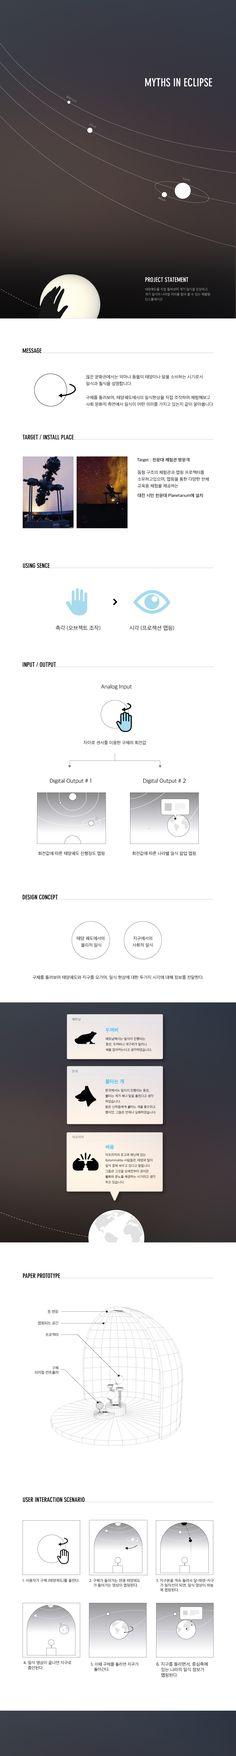 Hwang Hye Min | Myths In Eclipse | Information Visualization 2016│ Major in Digital Media Design │#hicoda │hicoda.hongik.ac.kr